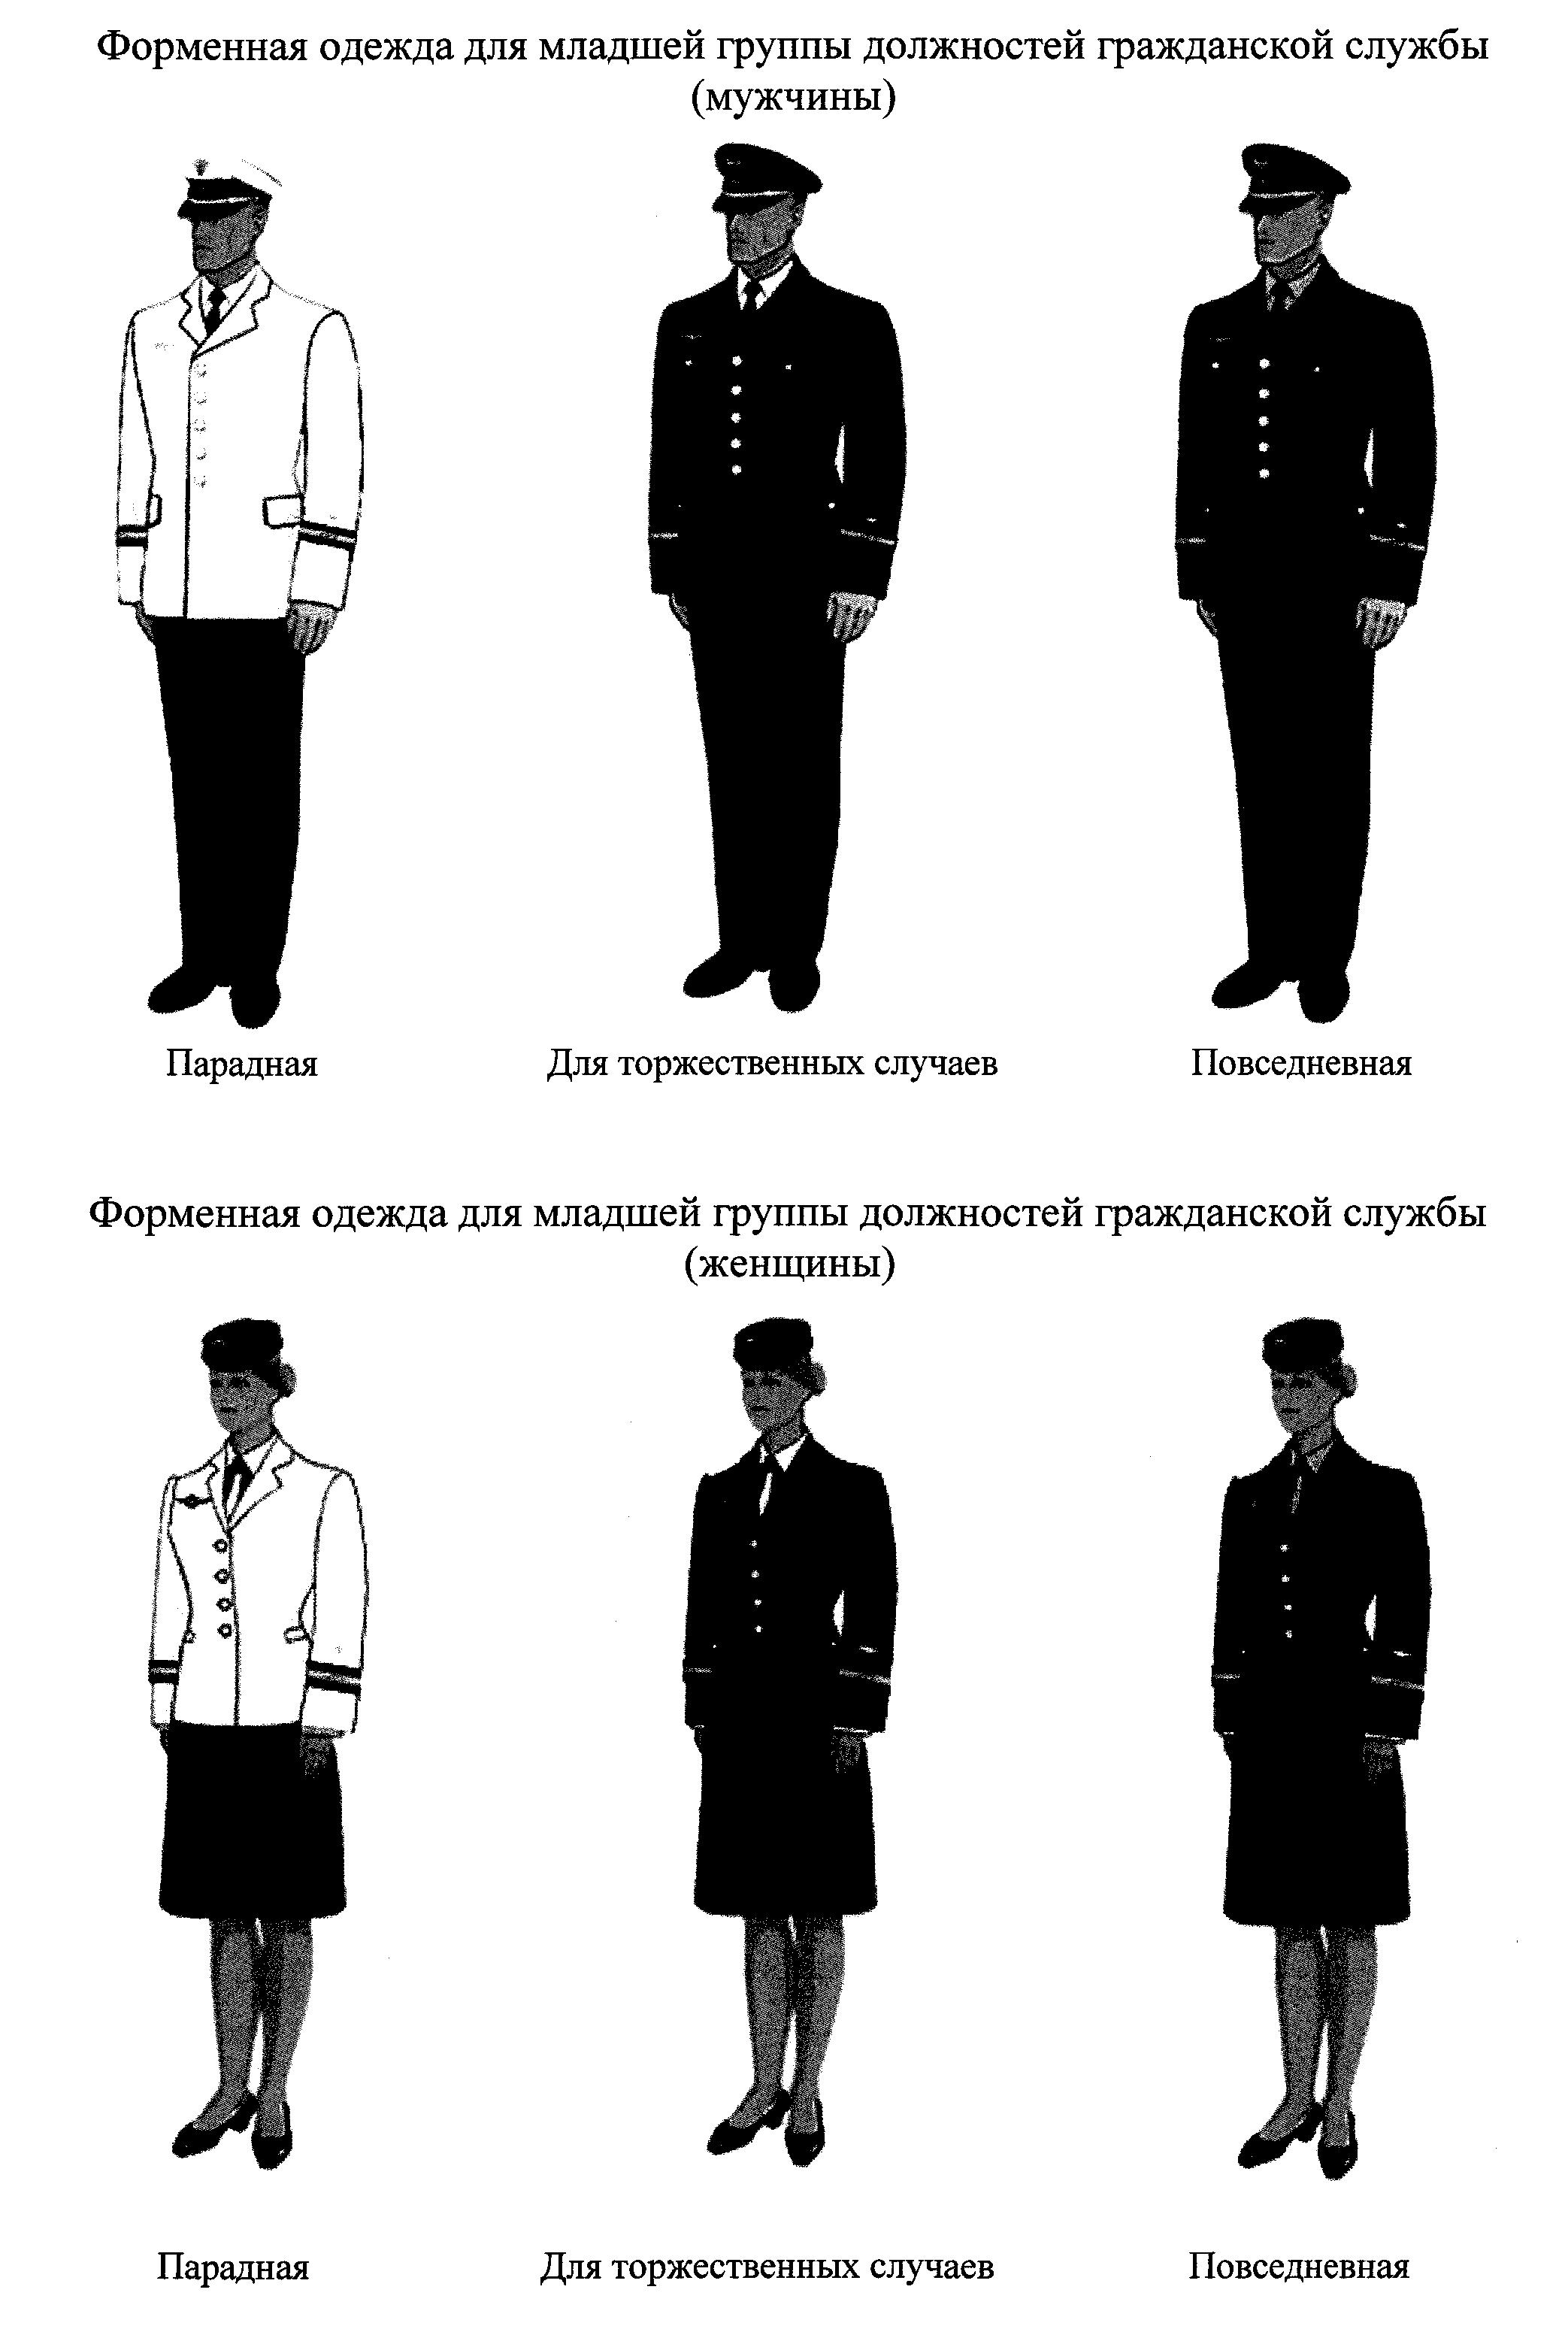 http://www.garant.ru/files/3/0/1098803/pict566-71526346.png